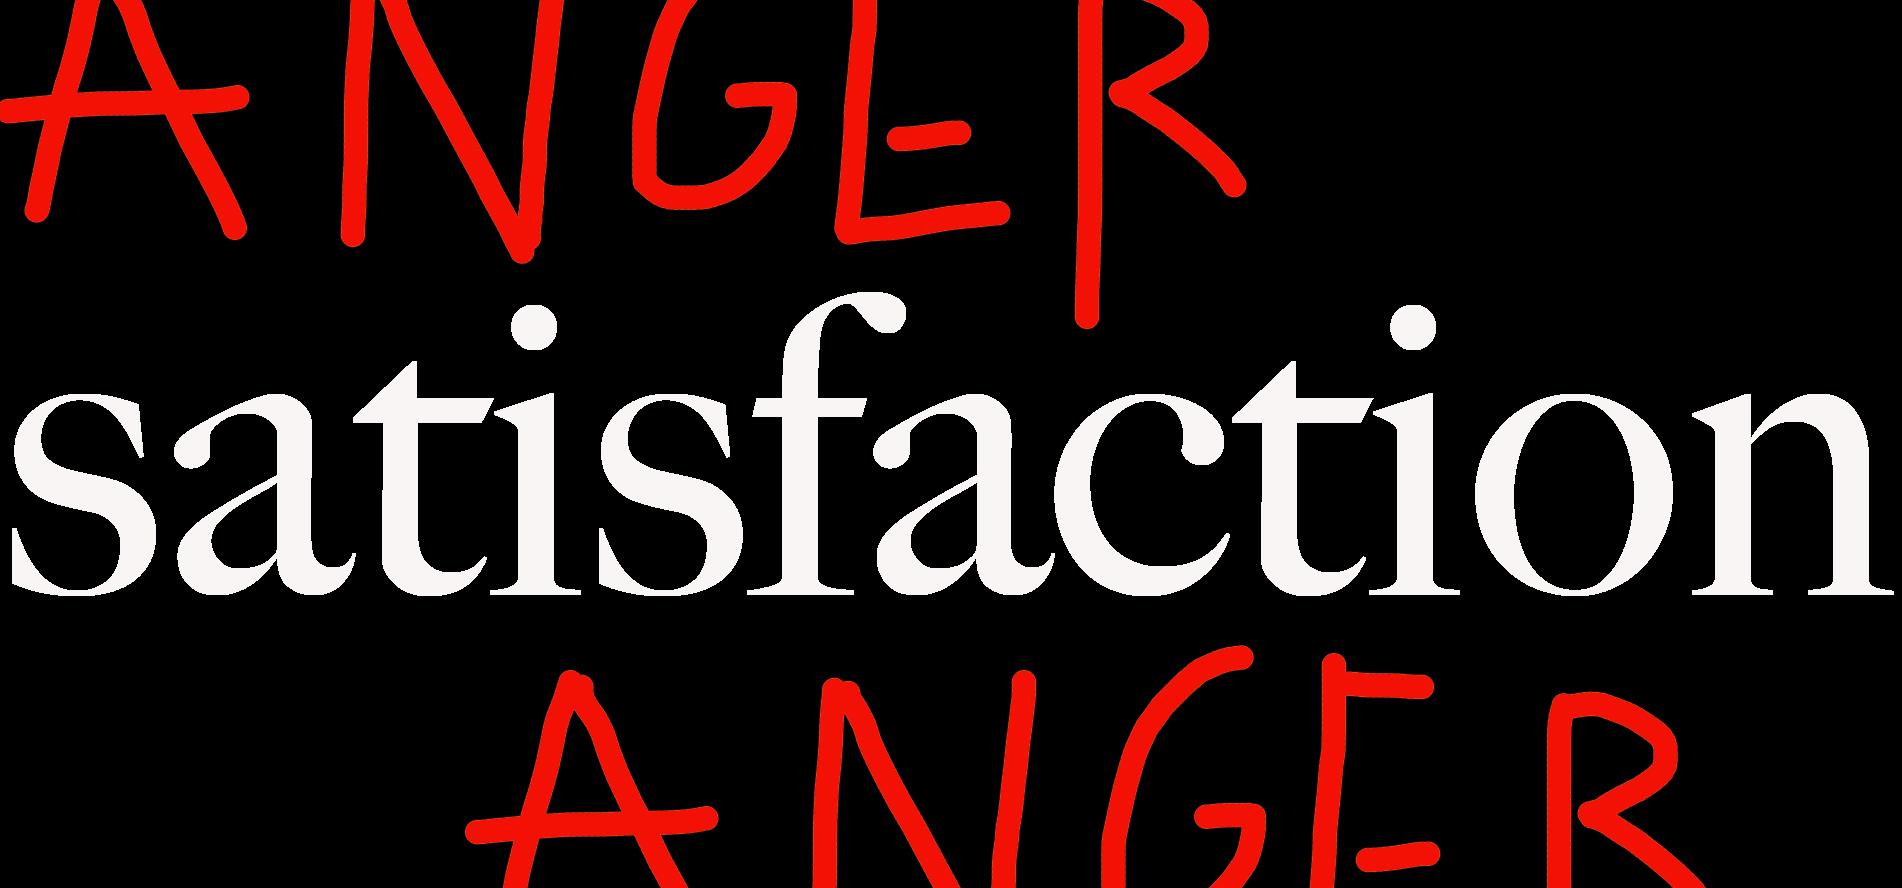 Satisfaction anger.jpg